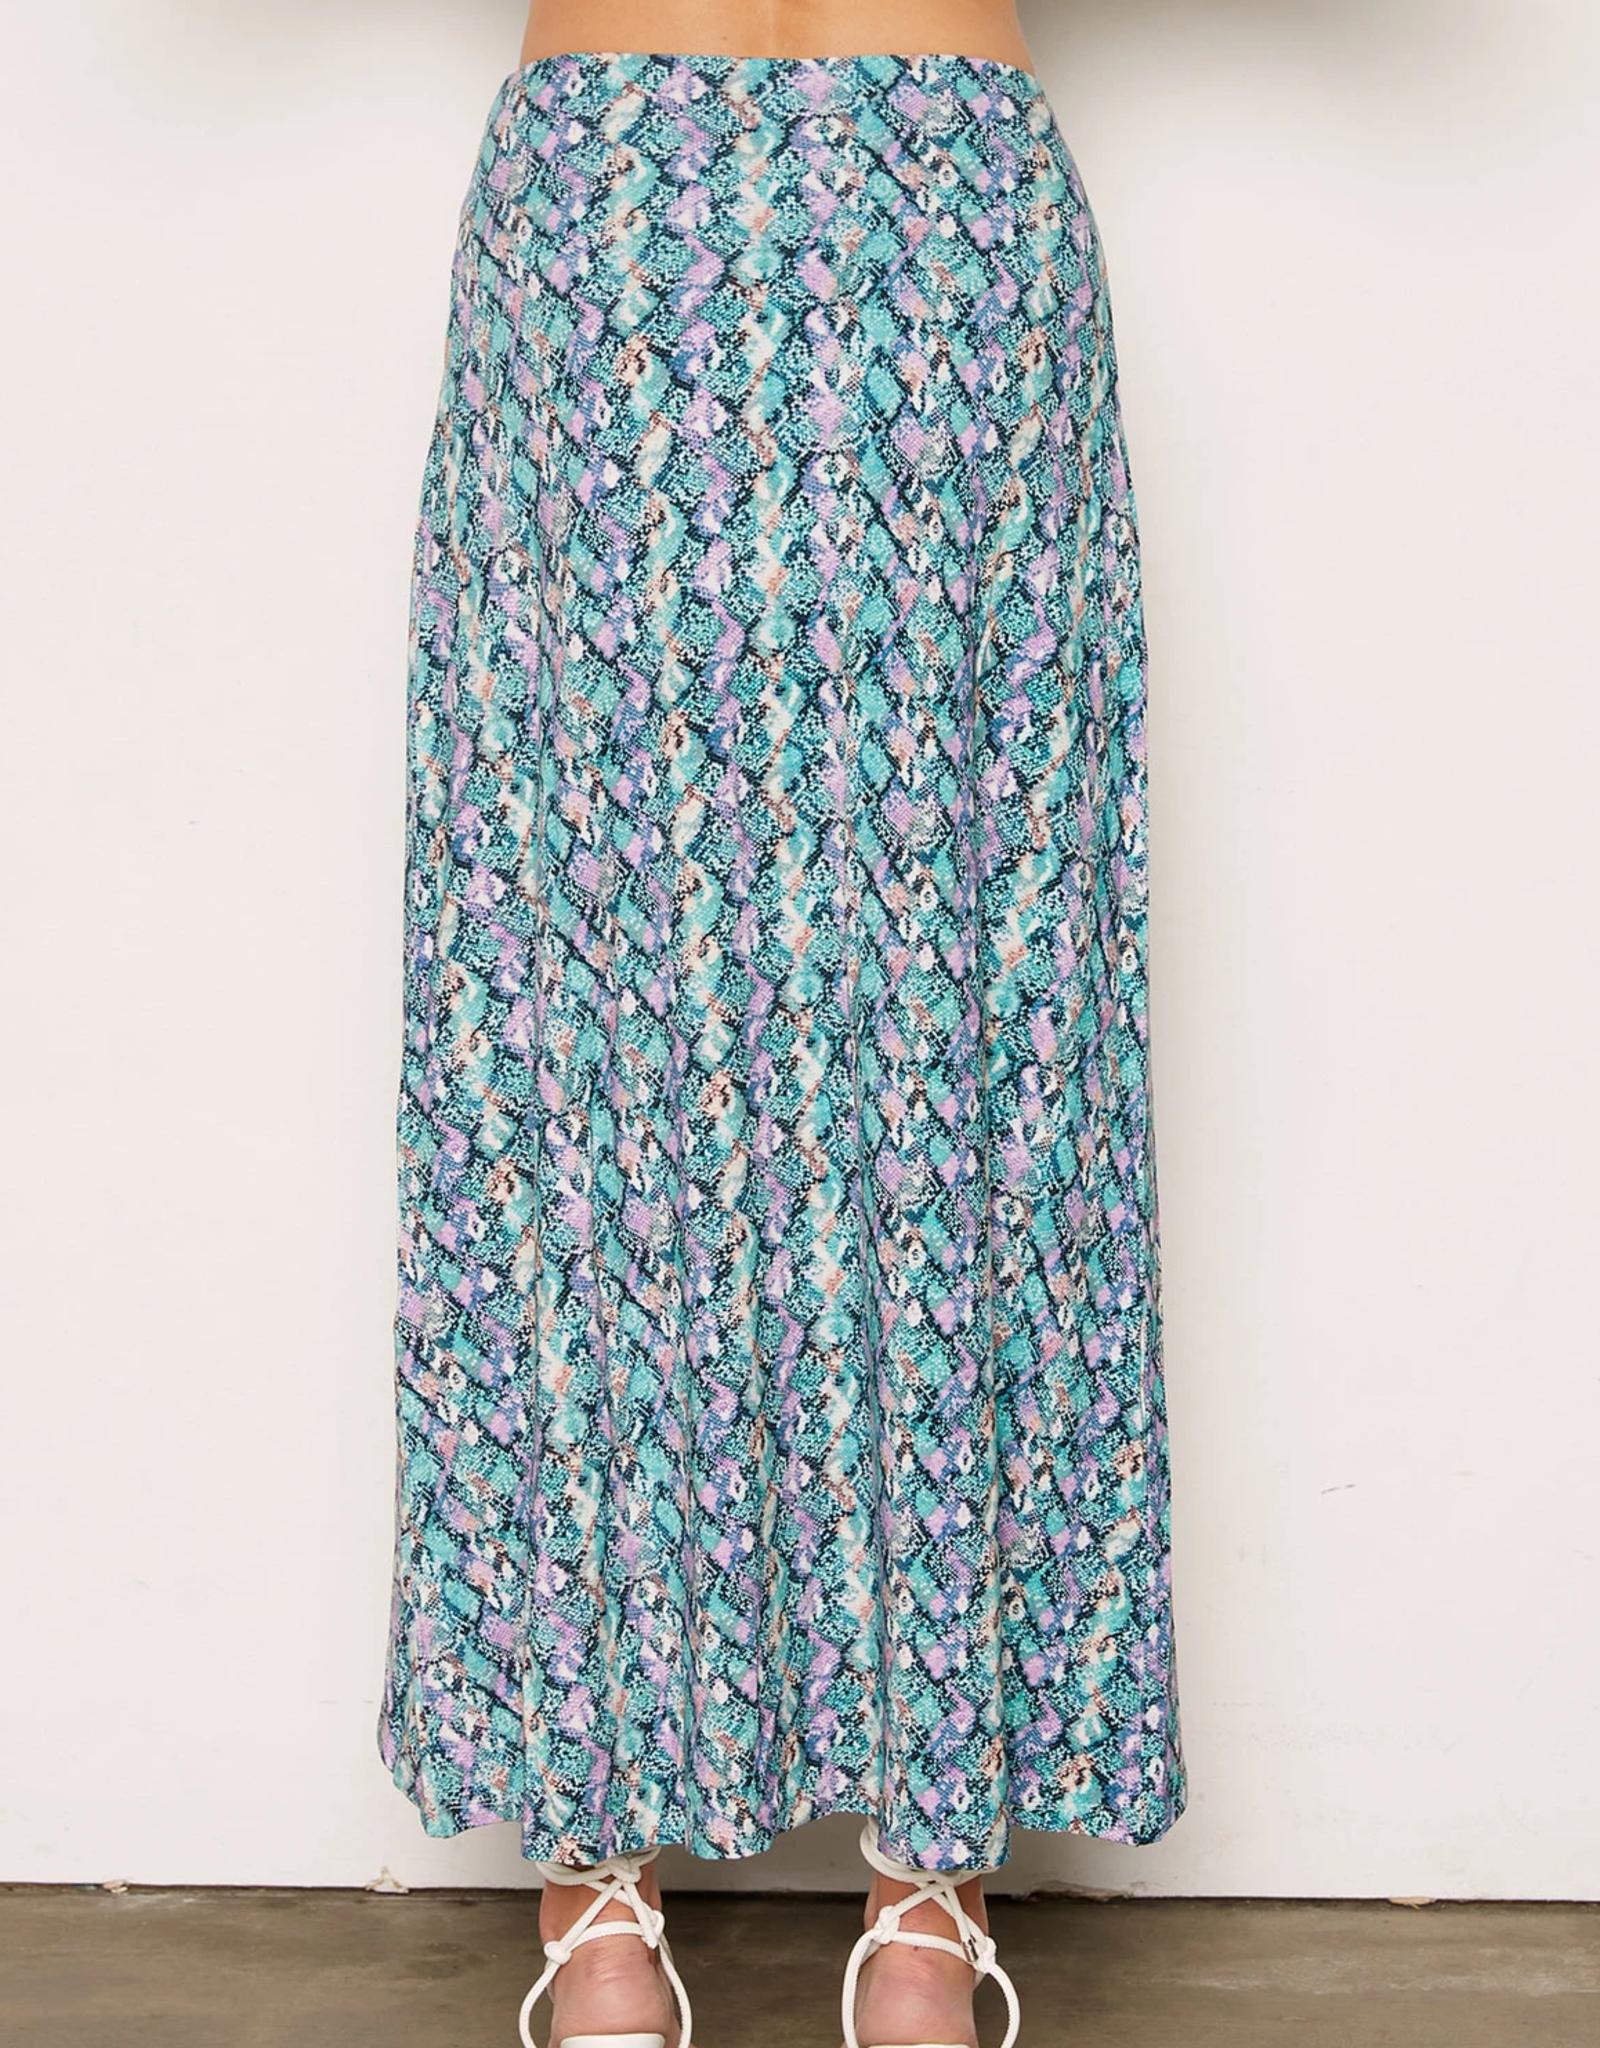 Tart Collections Trina Skirt